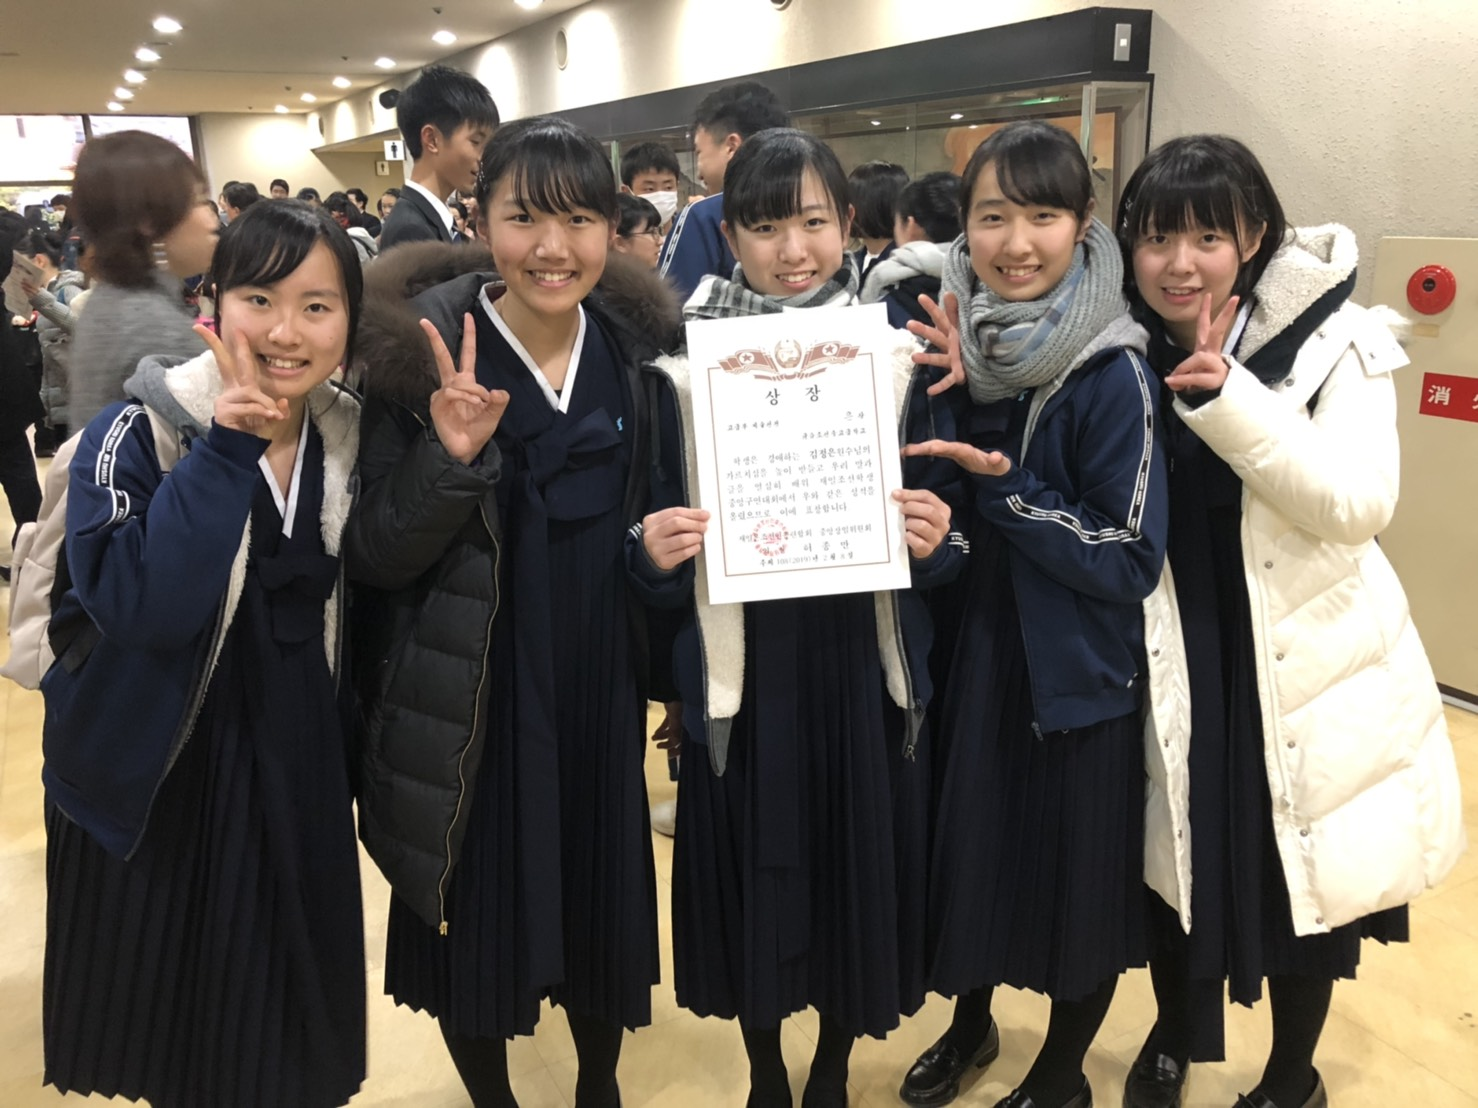 西日本中央口演大会、高級部英語雄弁大会のイメージ